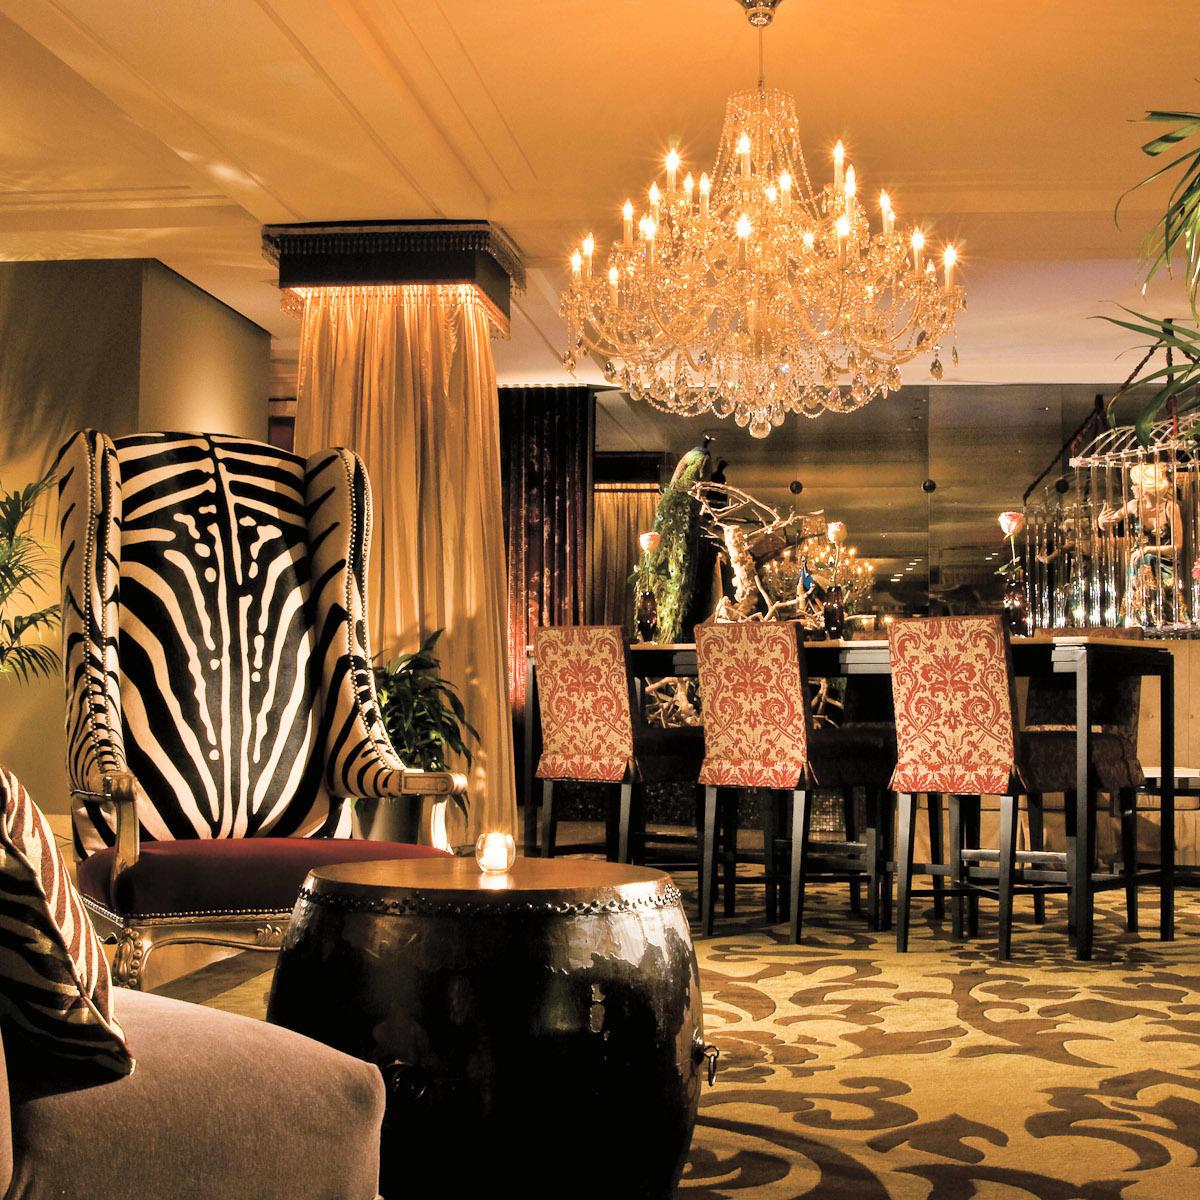 Places-Hotels/Spas-Hotel ZaZa-lobby